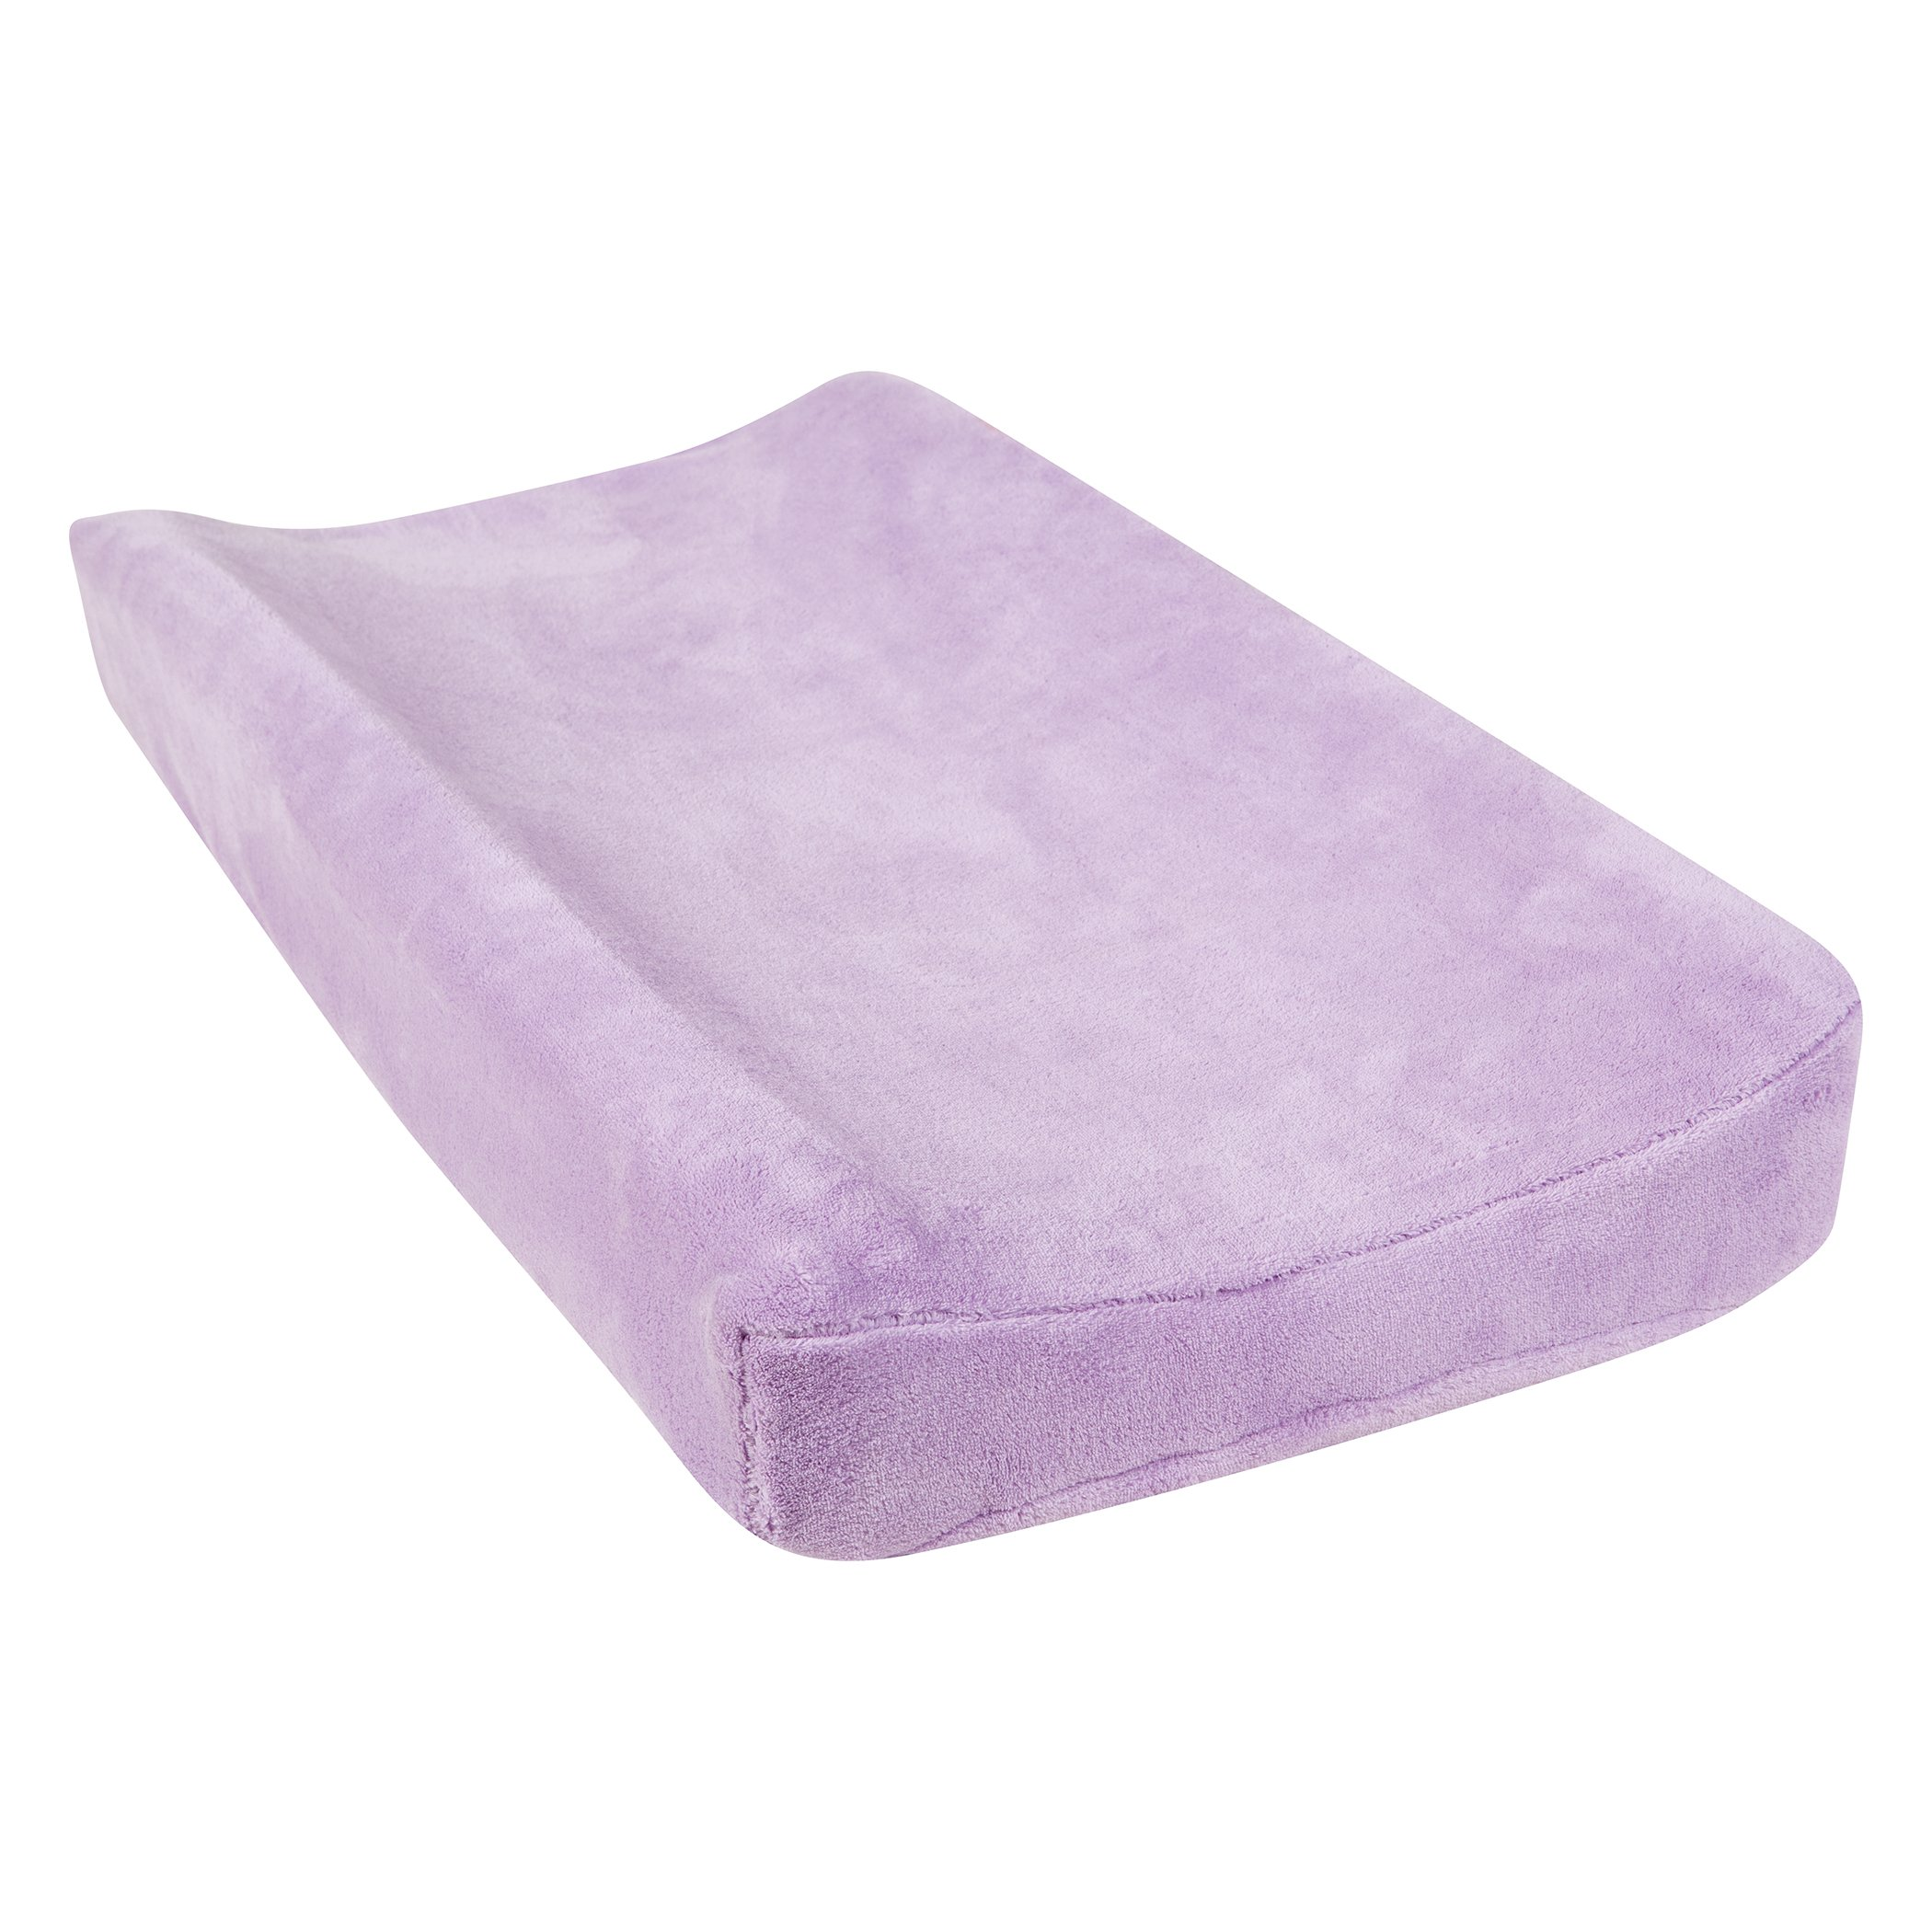 Trend Lab Lavendula Plush Changing Pad Cover, Purple by Trend Lab